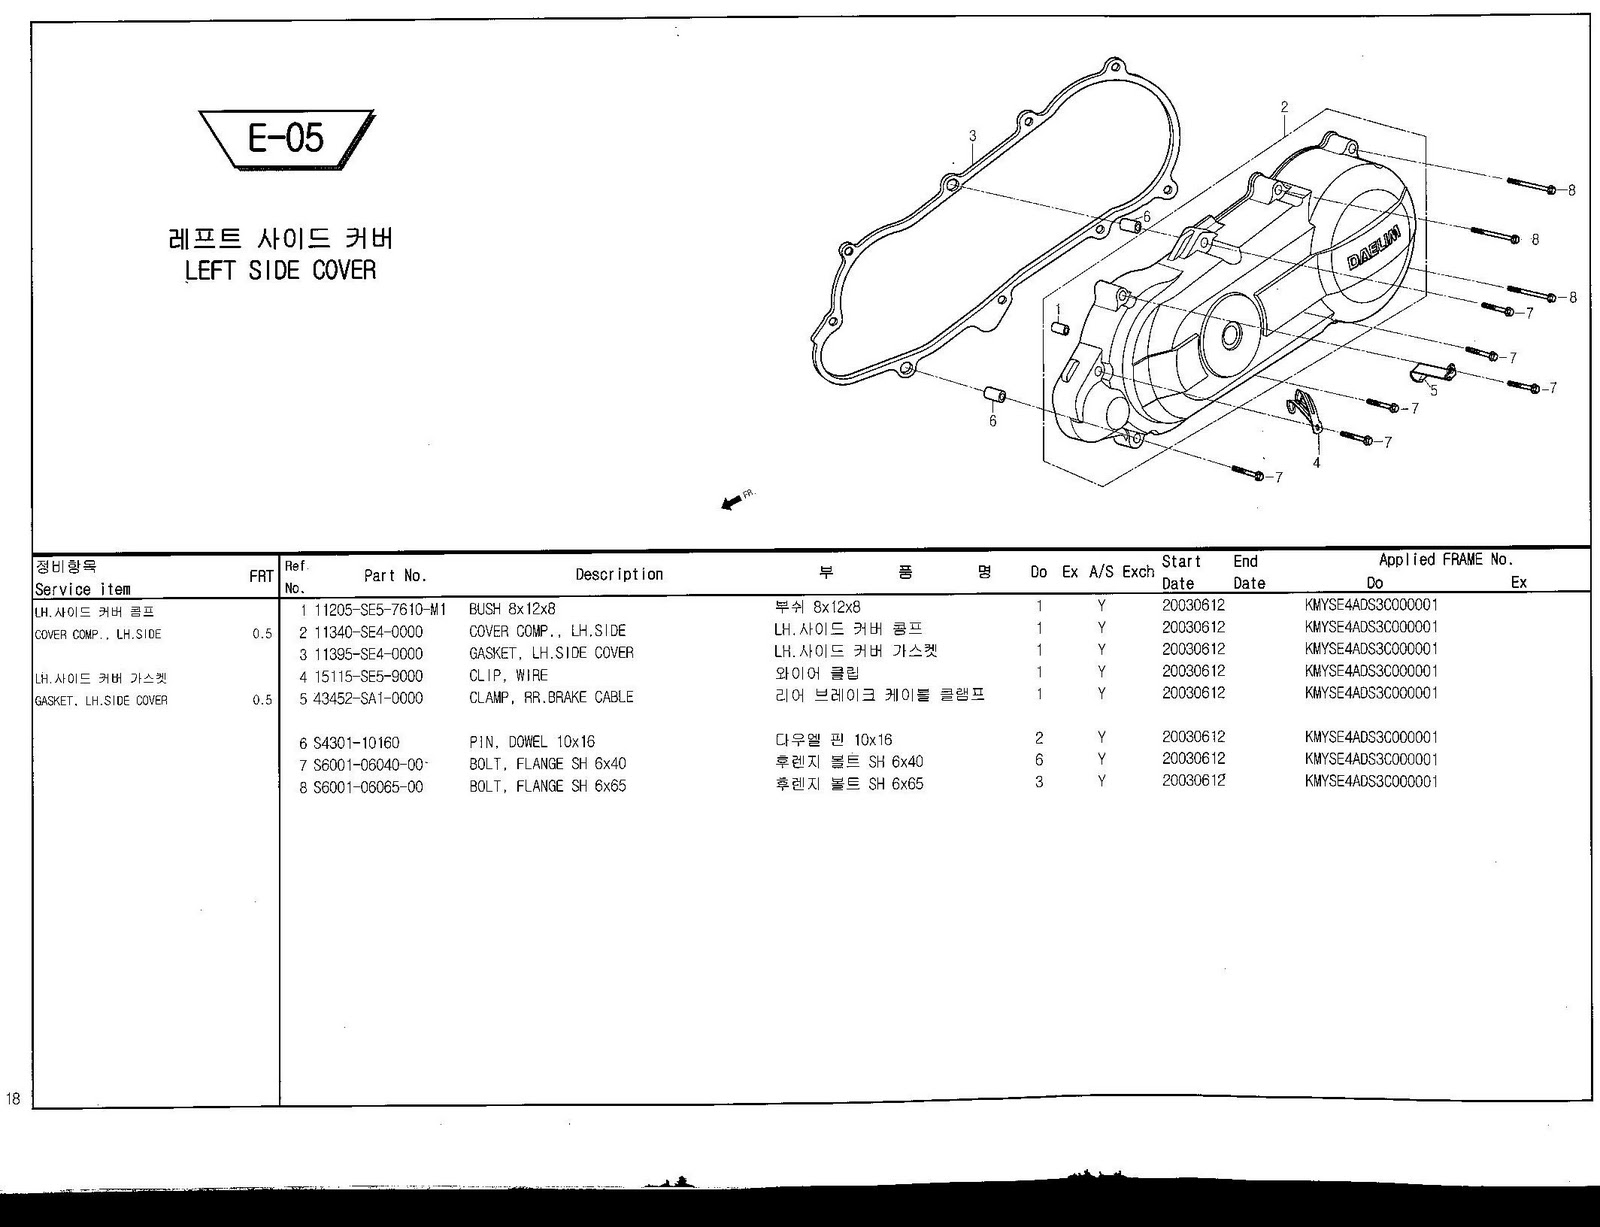 medium resolution of velux wiring diagram auto electrical wiring diagram simple alternator diagram 12v wiring x3cbx3ediagramx3c bx3e the